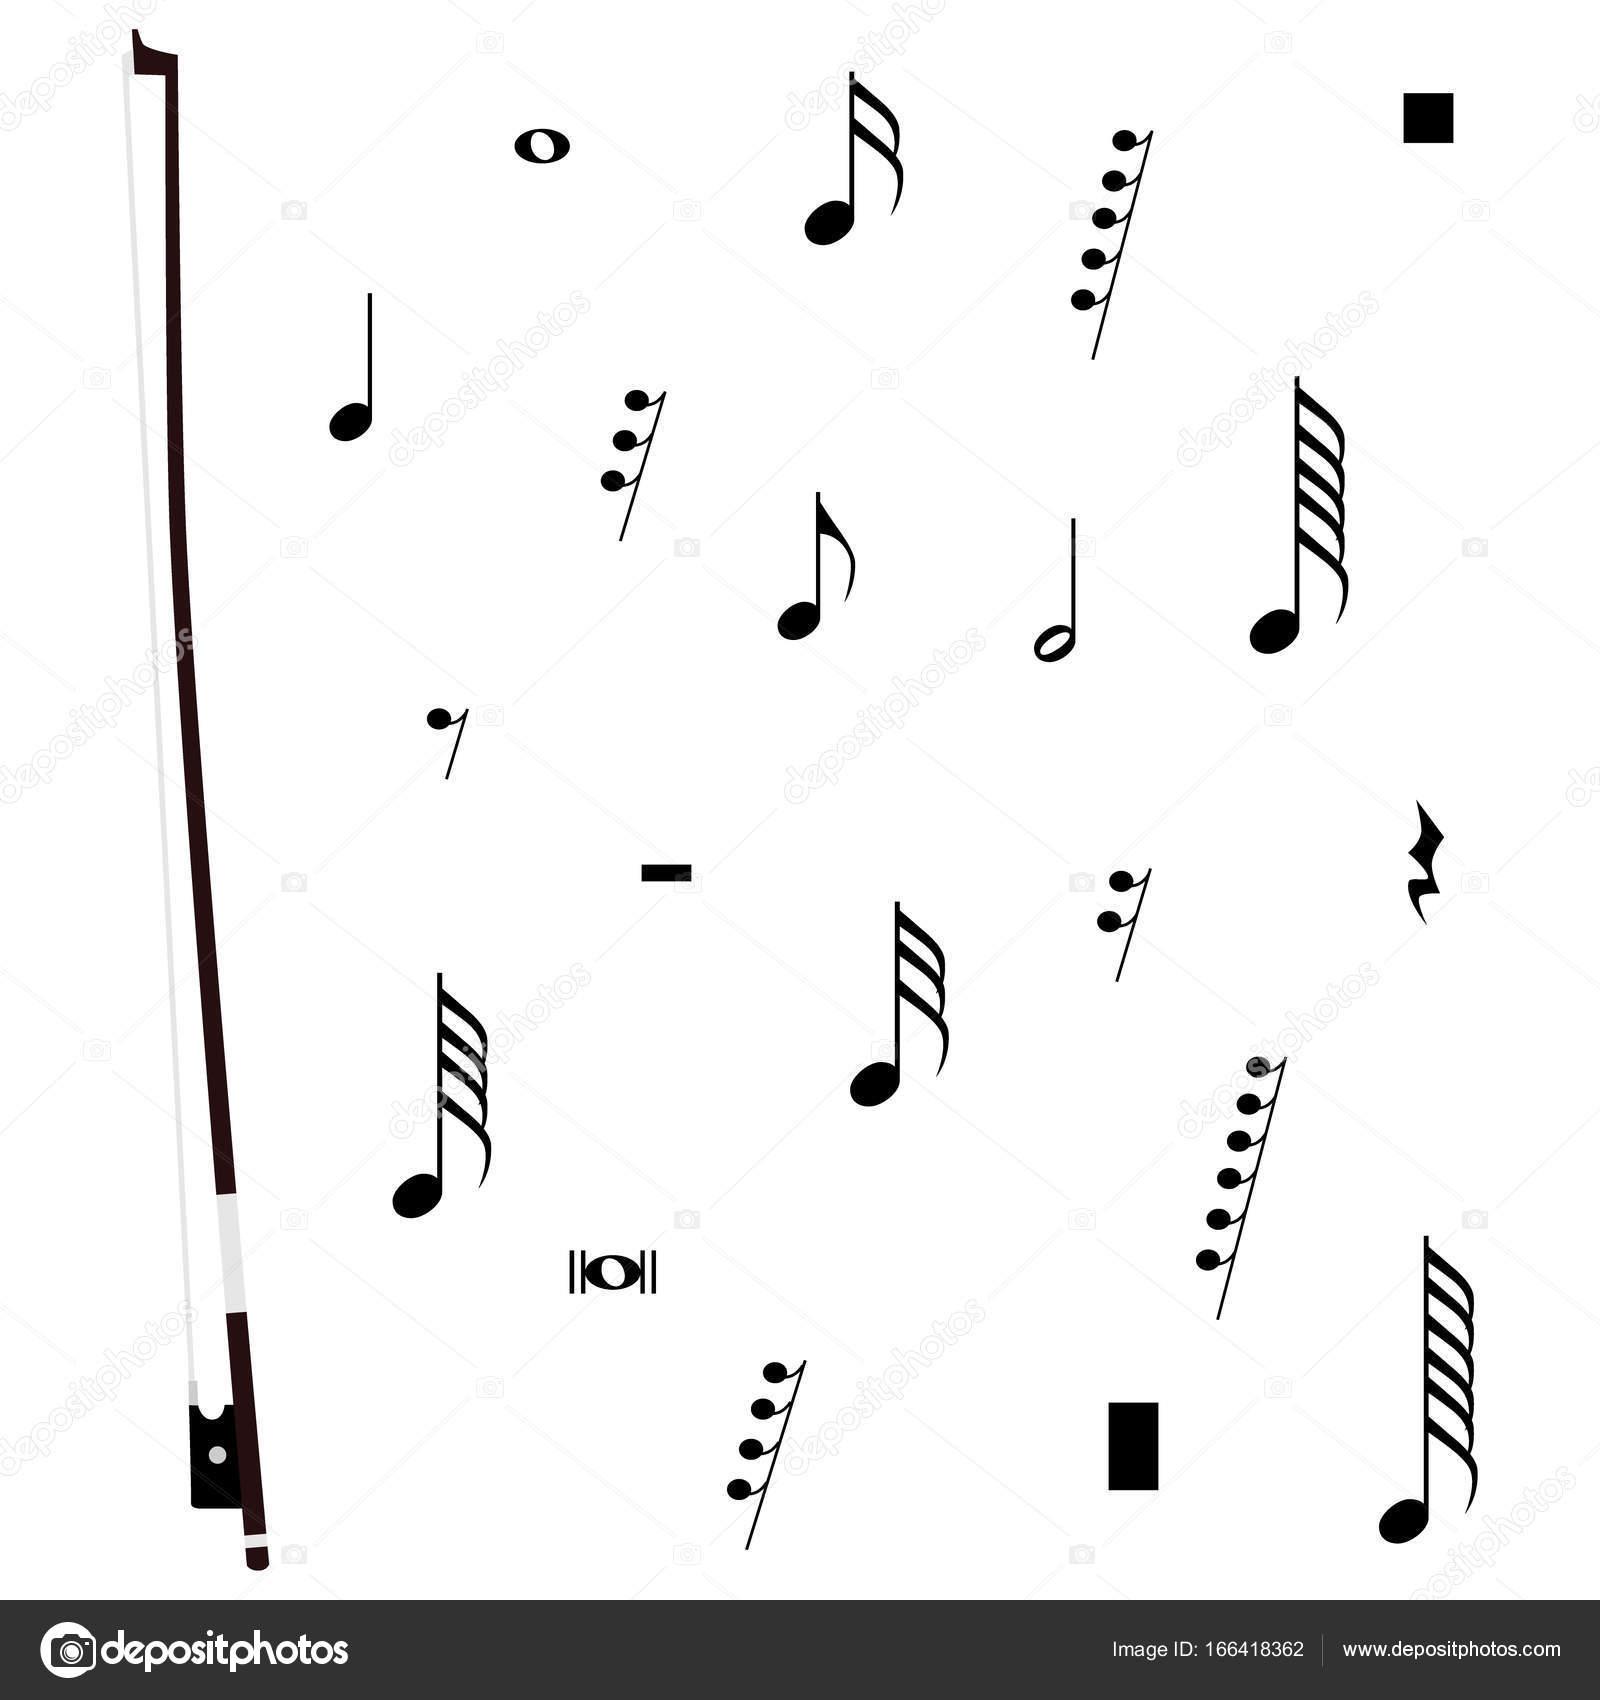 Musical notation symbols stock photo viktorijareut 166418362 musical notation symbols stock photo biocorpaavc